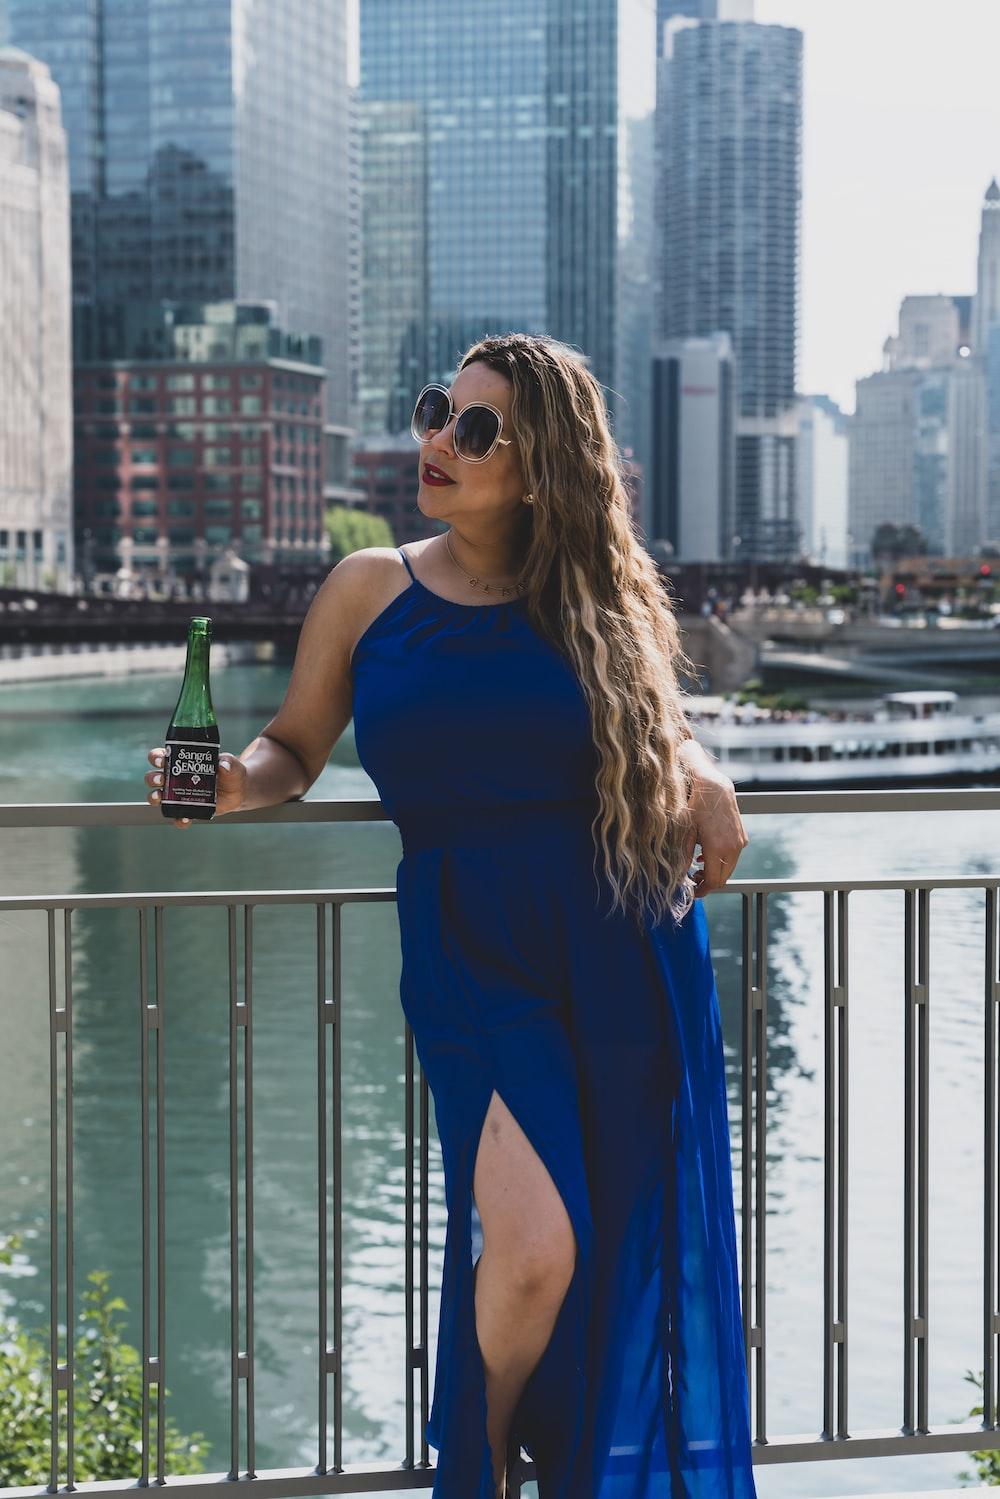 woman in blue tank top holding green glass bottle